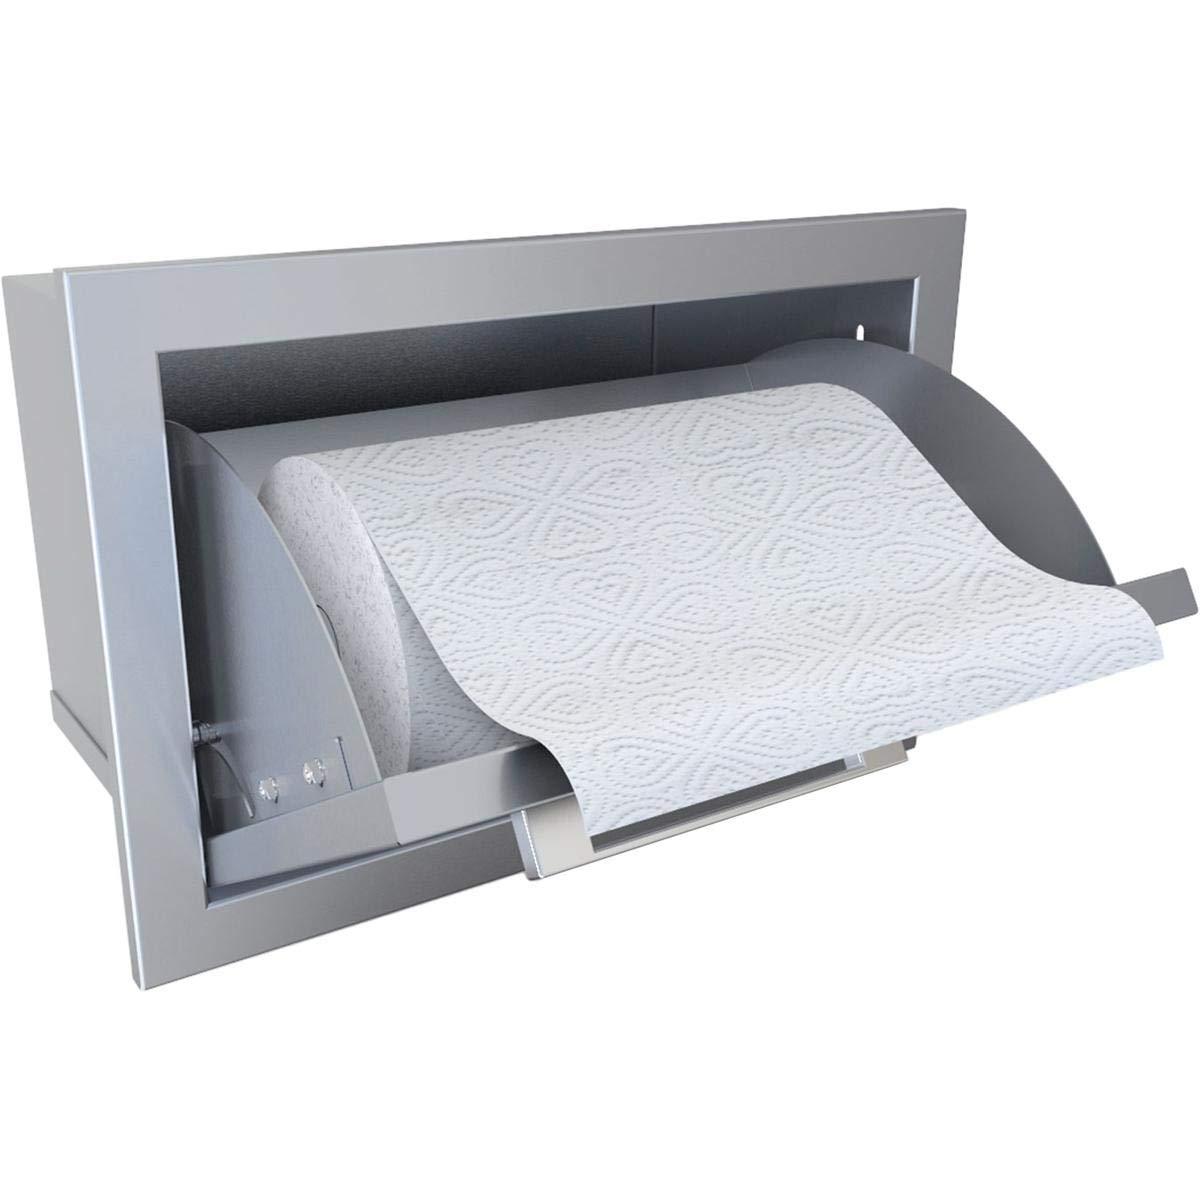 SUNSTONE BA-TH17 Signature Series Beveled Frame Swivel Paper Towel Holder by SUNSTONE